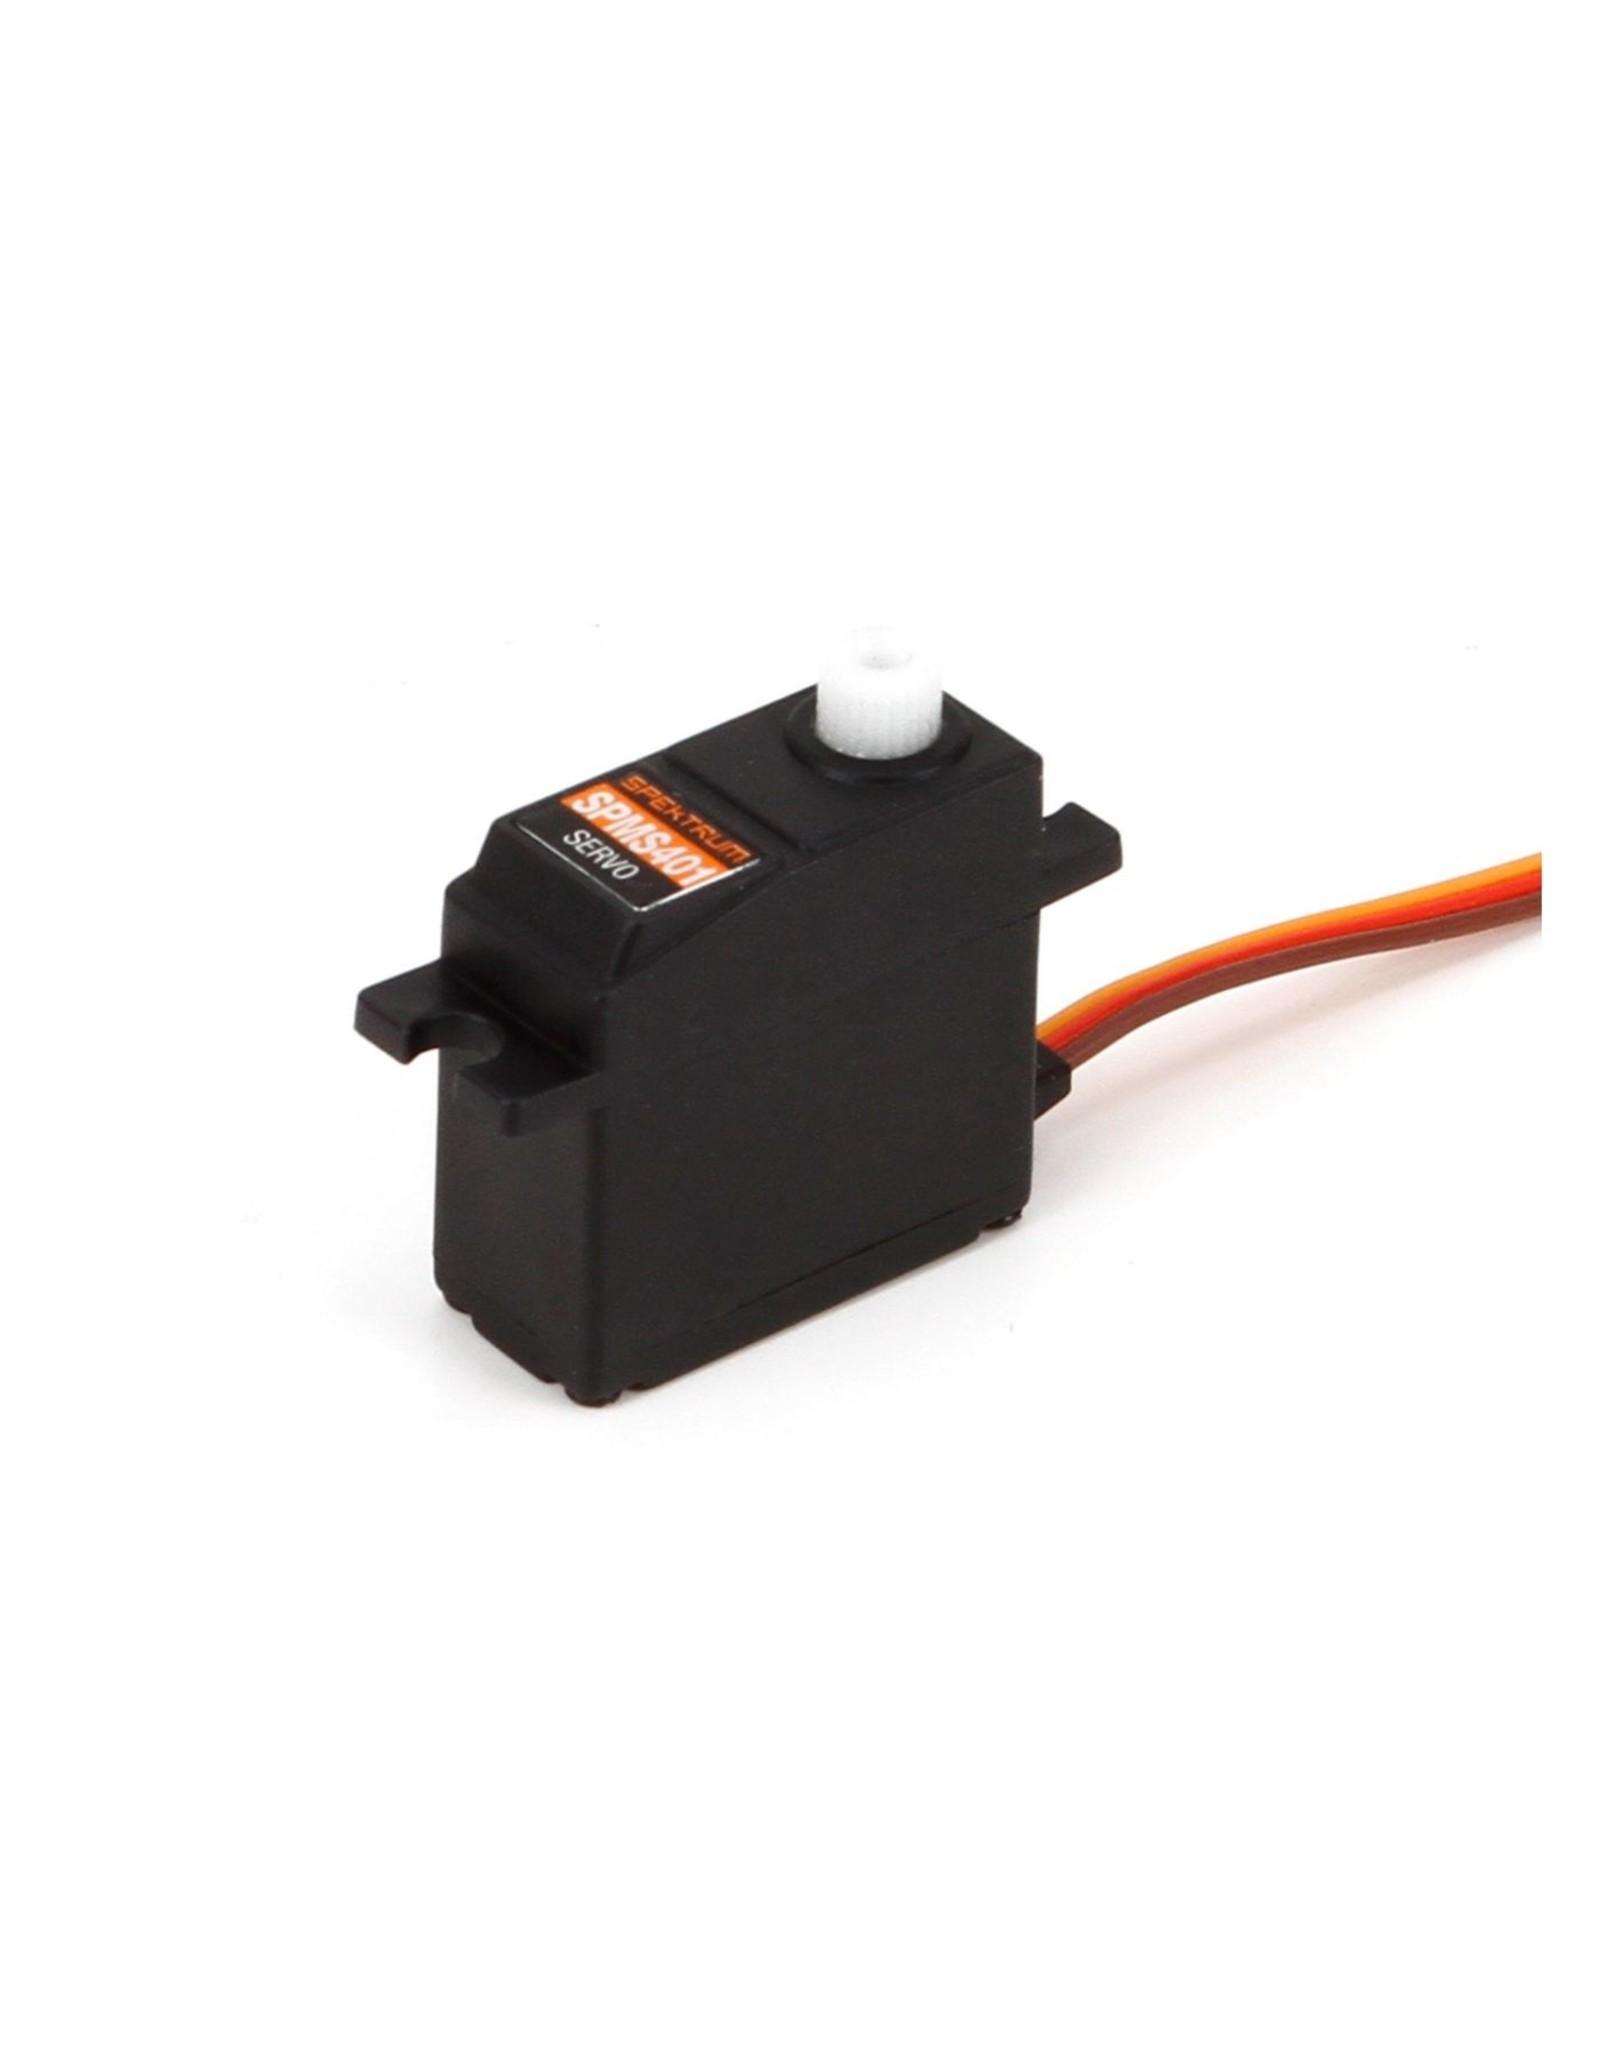 Spektrum S401 - Replacement Mini Servo